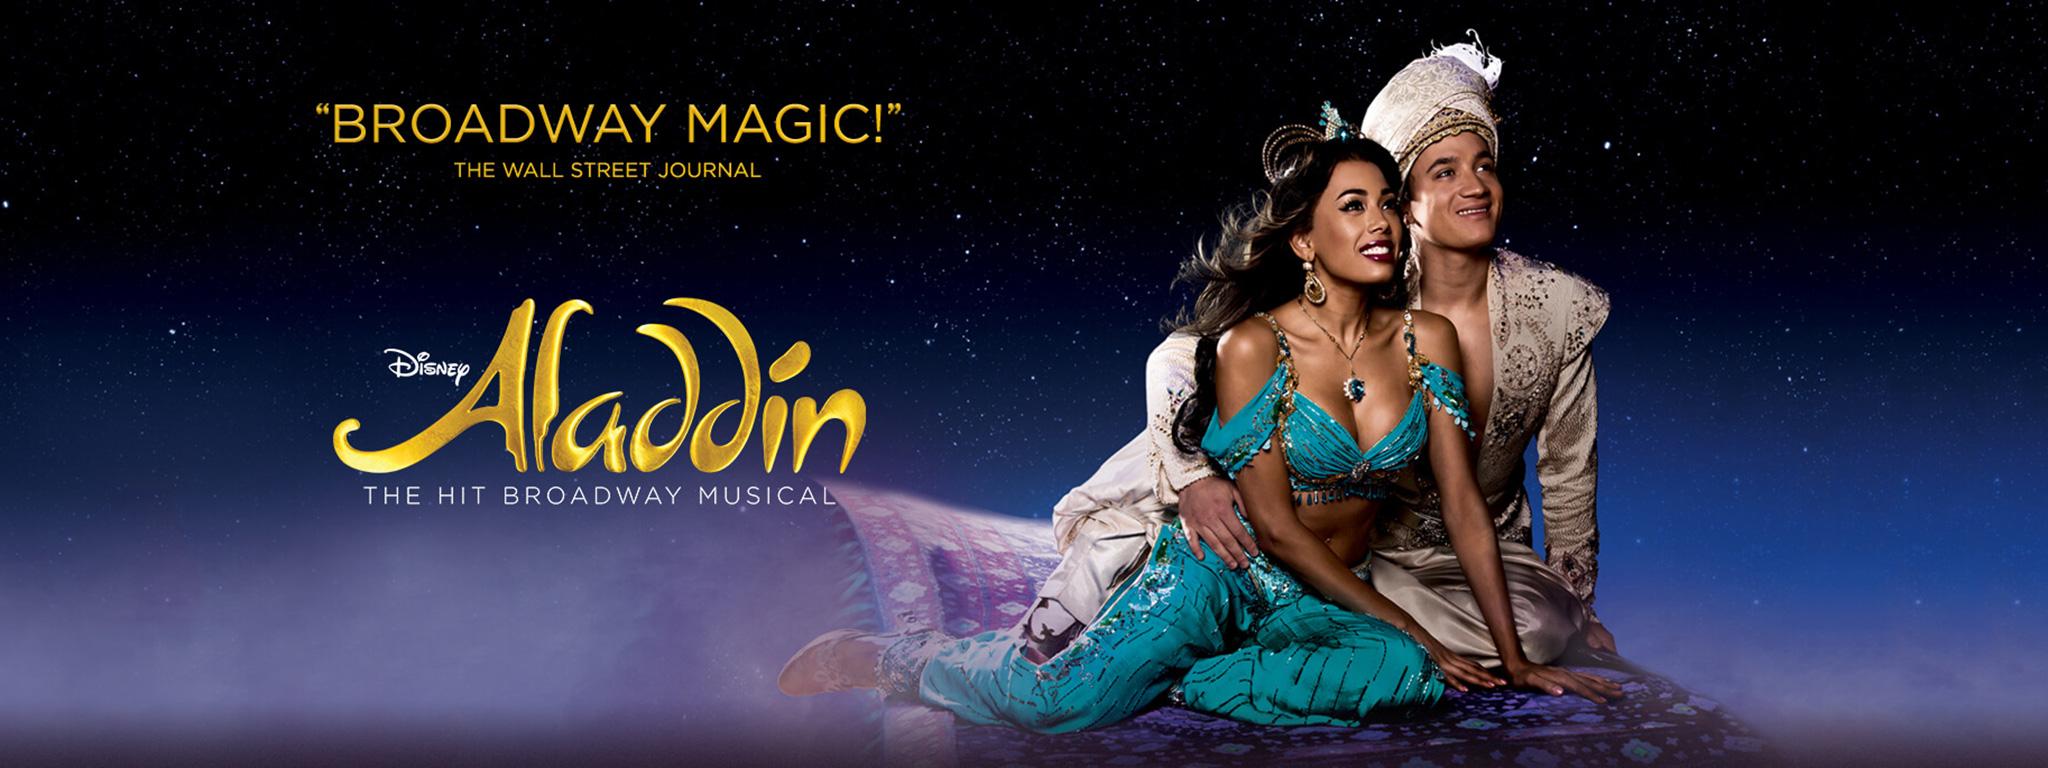 Disney ALADDIN - The Hit Broadway Musical - Get Tickets